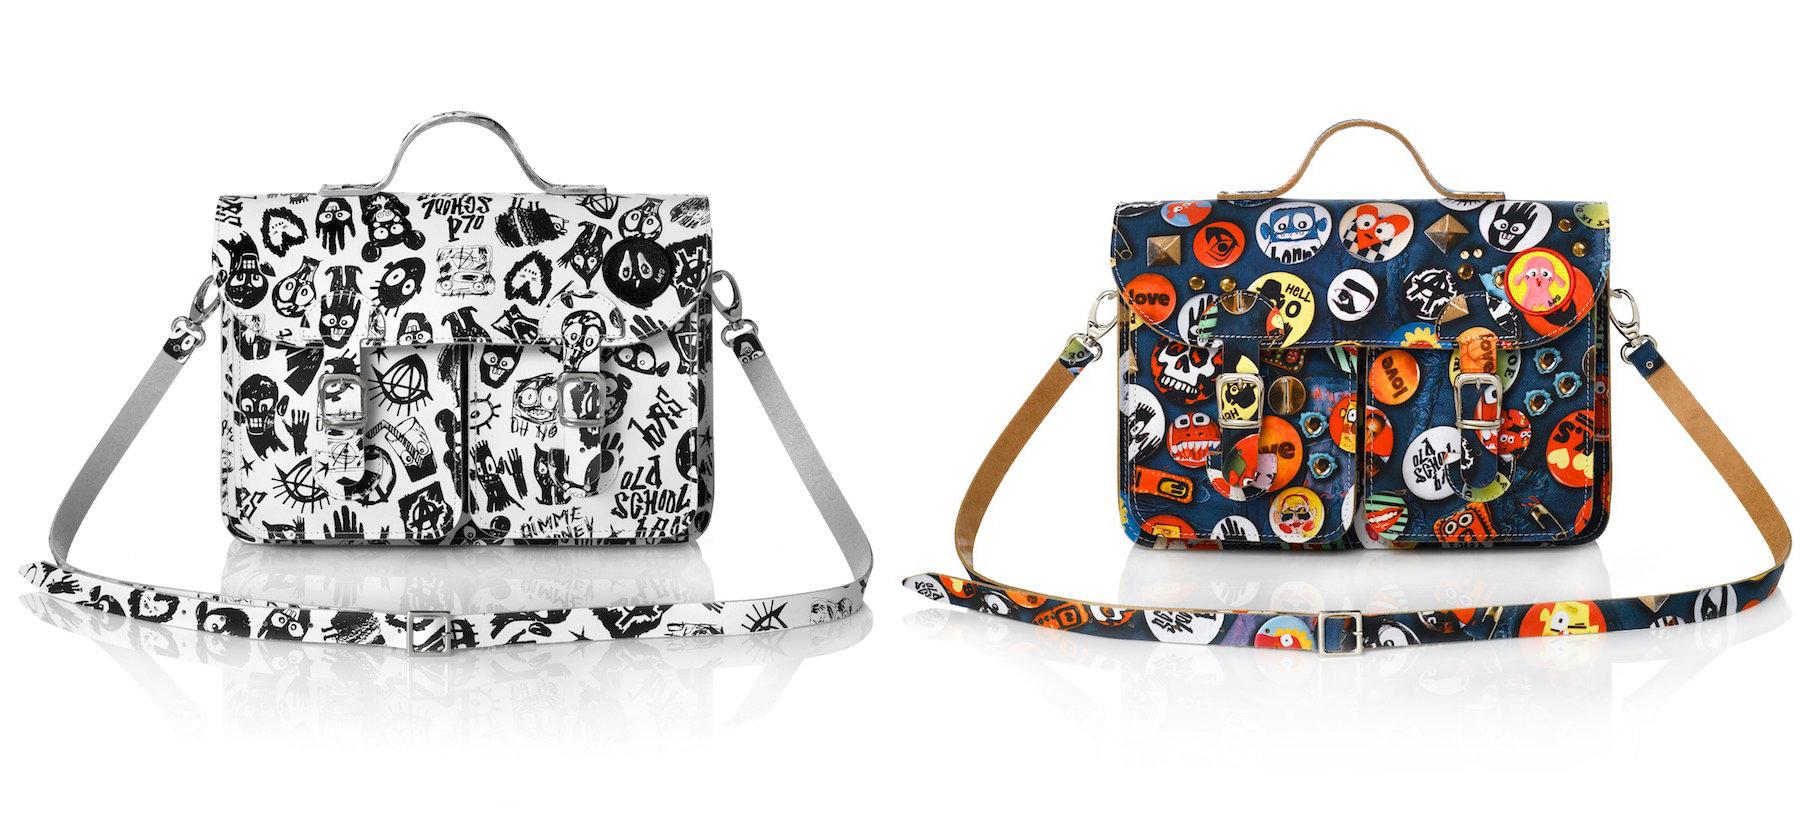 Bas Kosters bags (for OldSchool Bags)